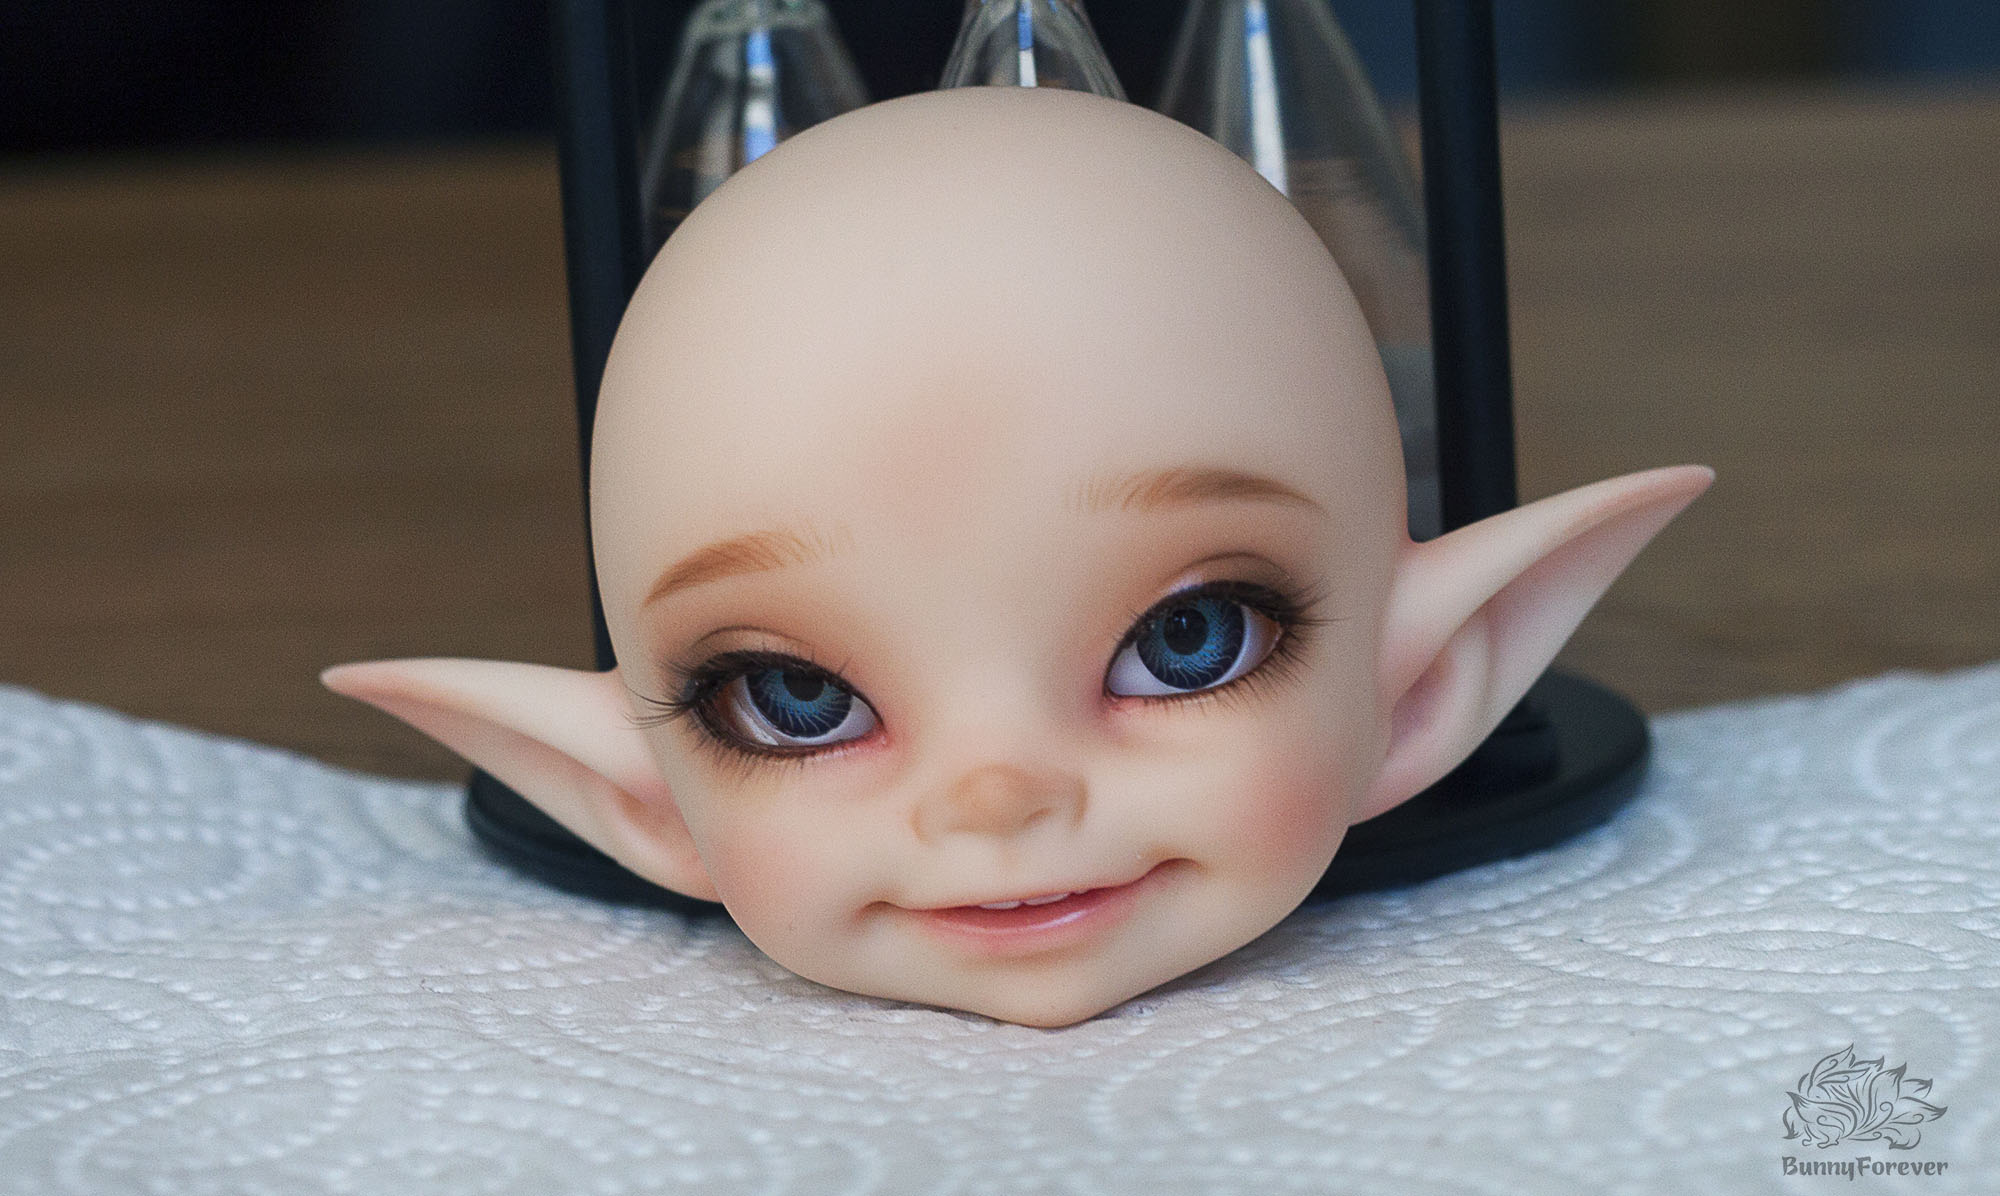 balljointeddoll, ball jointed doll, bjd, bjd doll, face-up, faceup, face-up bjd, faceup bjd. faceup commission, face-up commission, búp bê bjd, bjddoll, balljointdoll, fairyland, pukipuki, soso